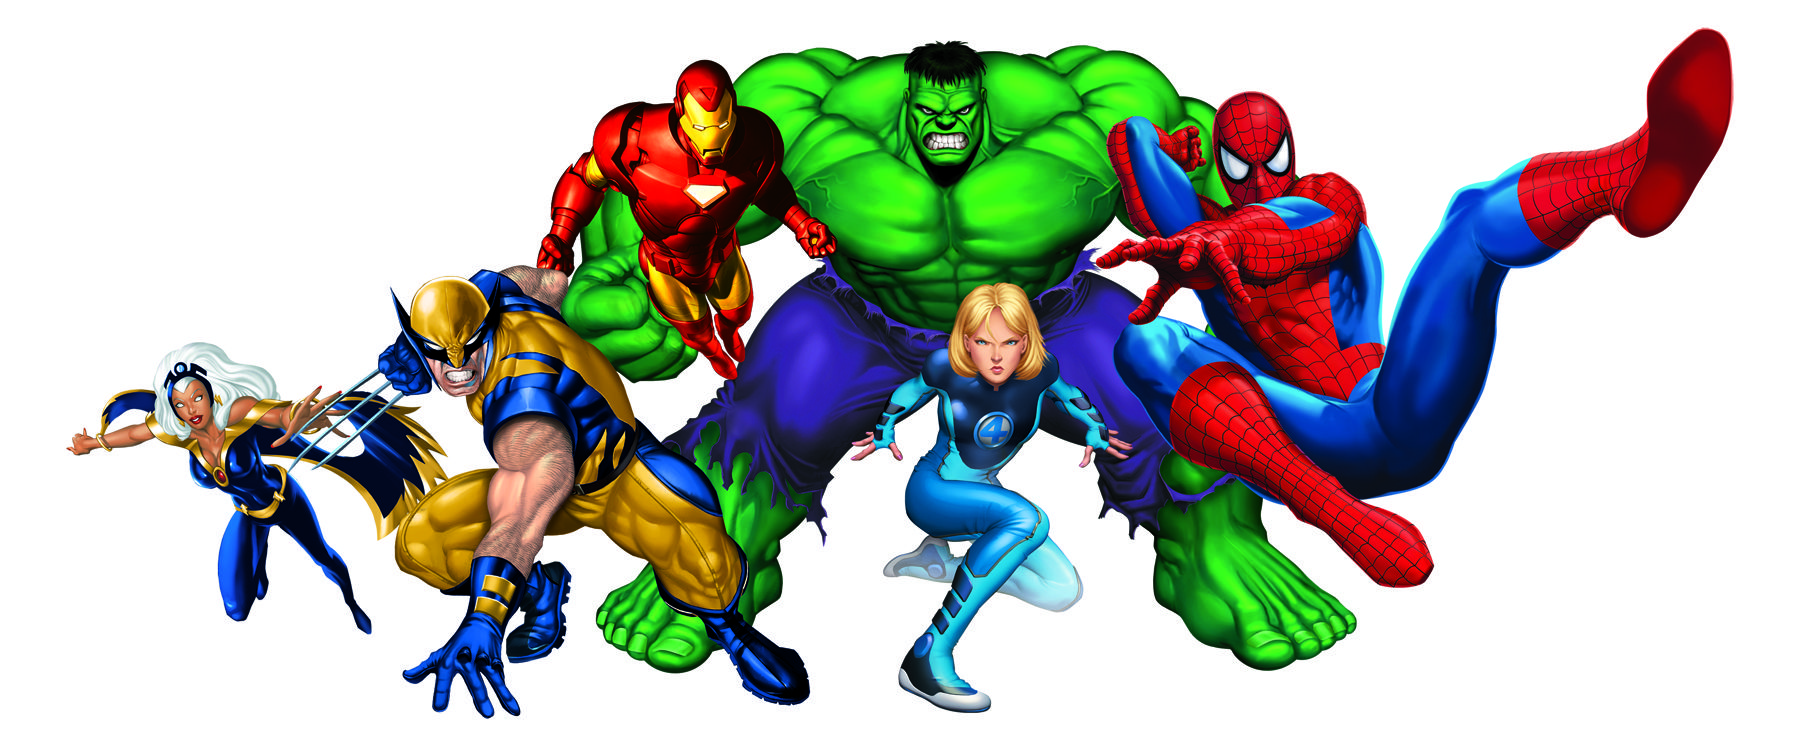 Image result for superheroes